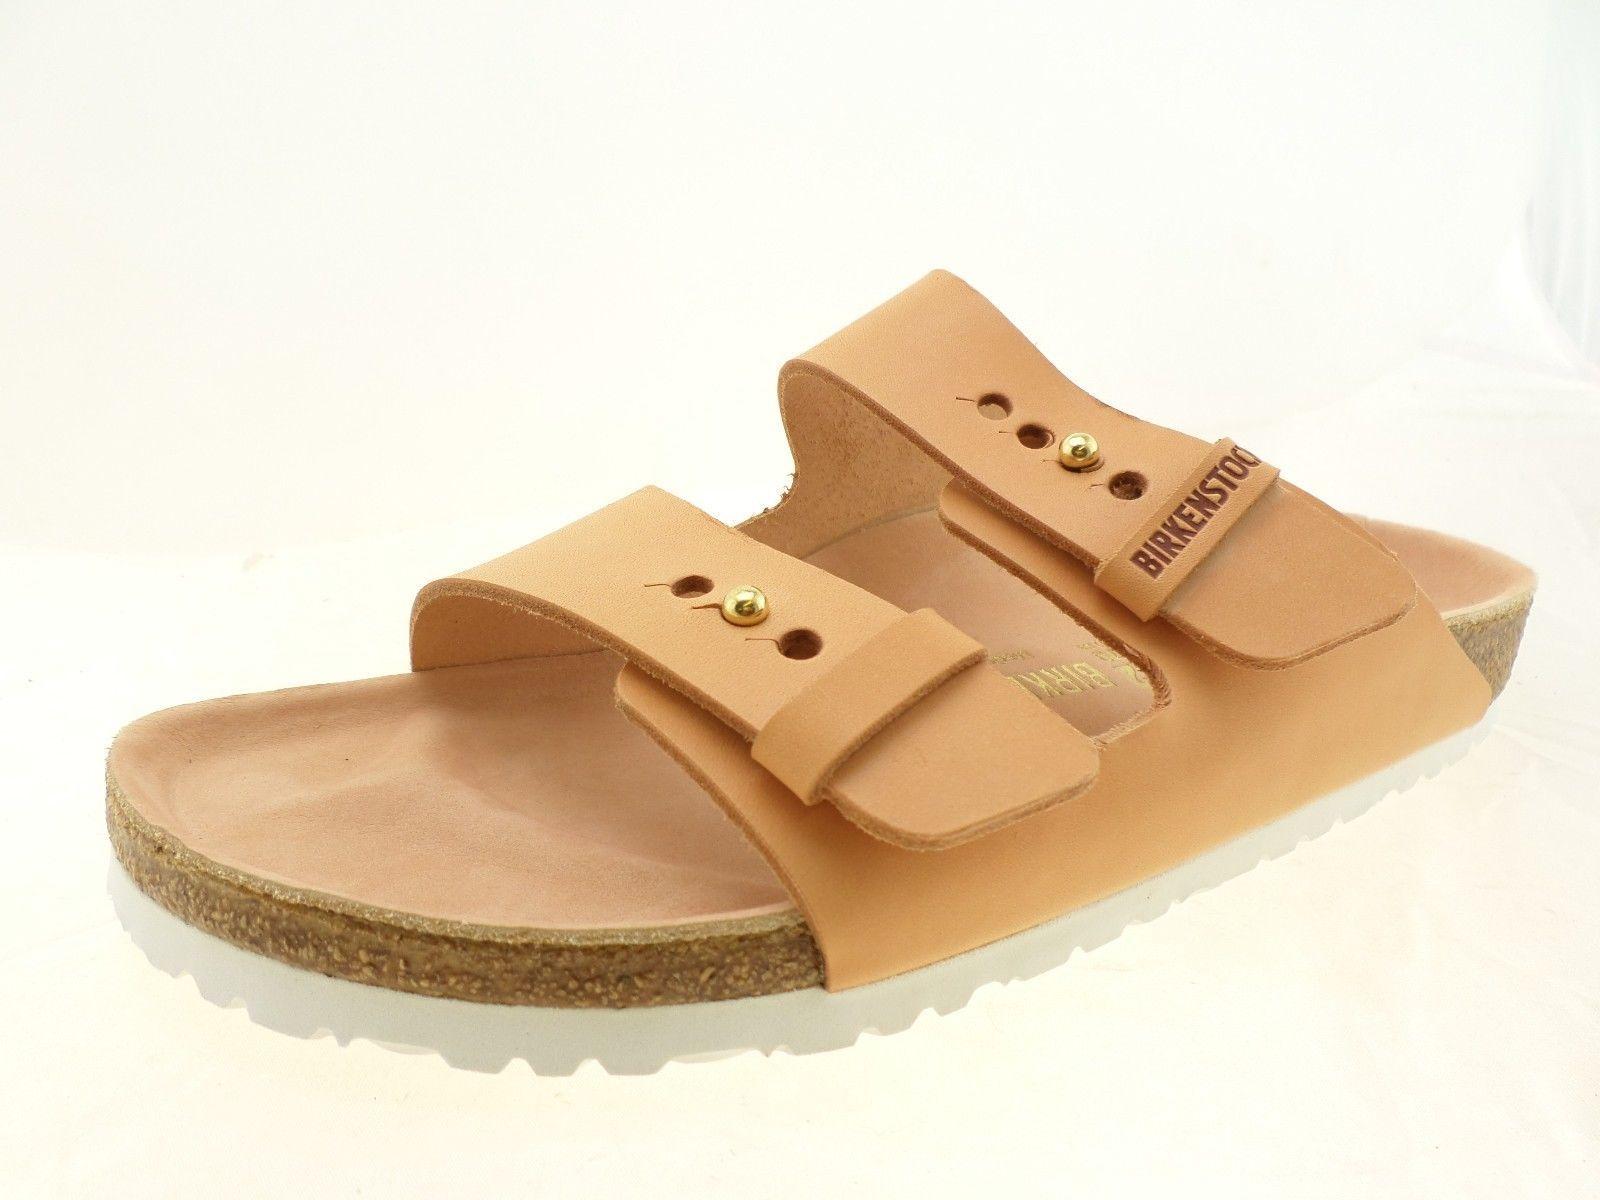 birkenstock arizona urban womens sandals 653123 natural powder size 42 sandals flip flops. Black Bedroom Furniture Sets. Home Design Ideas